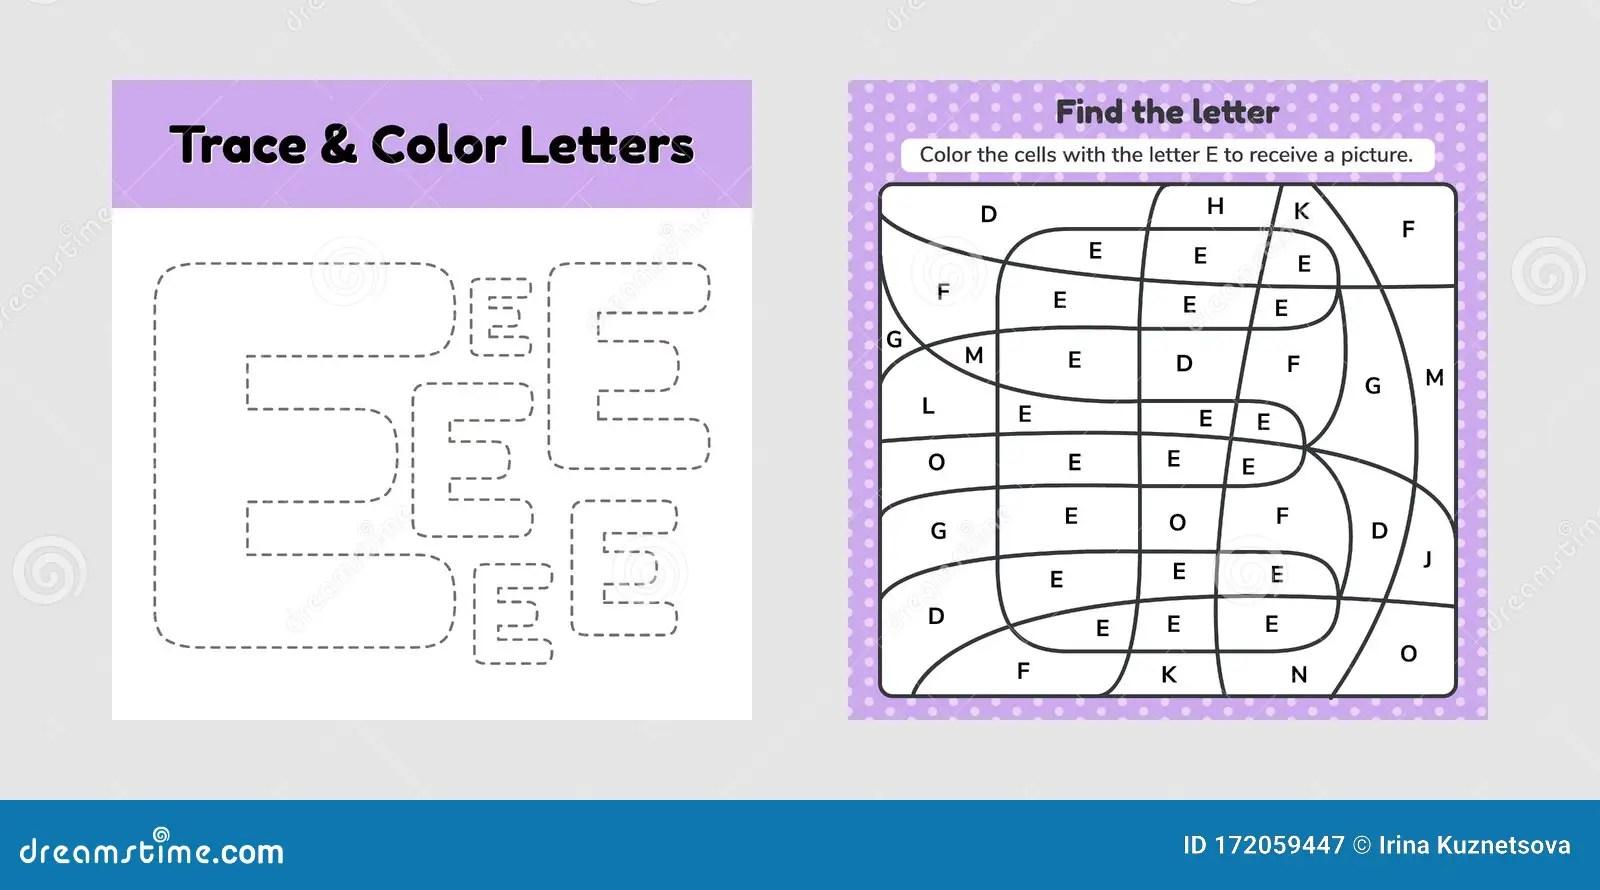 Coloring Book Letter For Kids Worksheet For Preschool